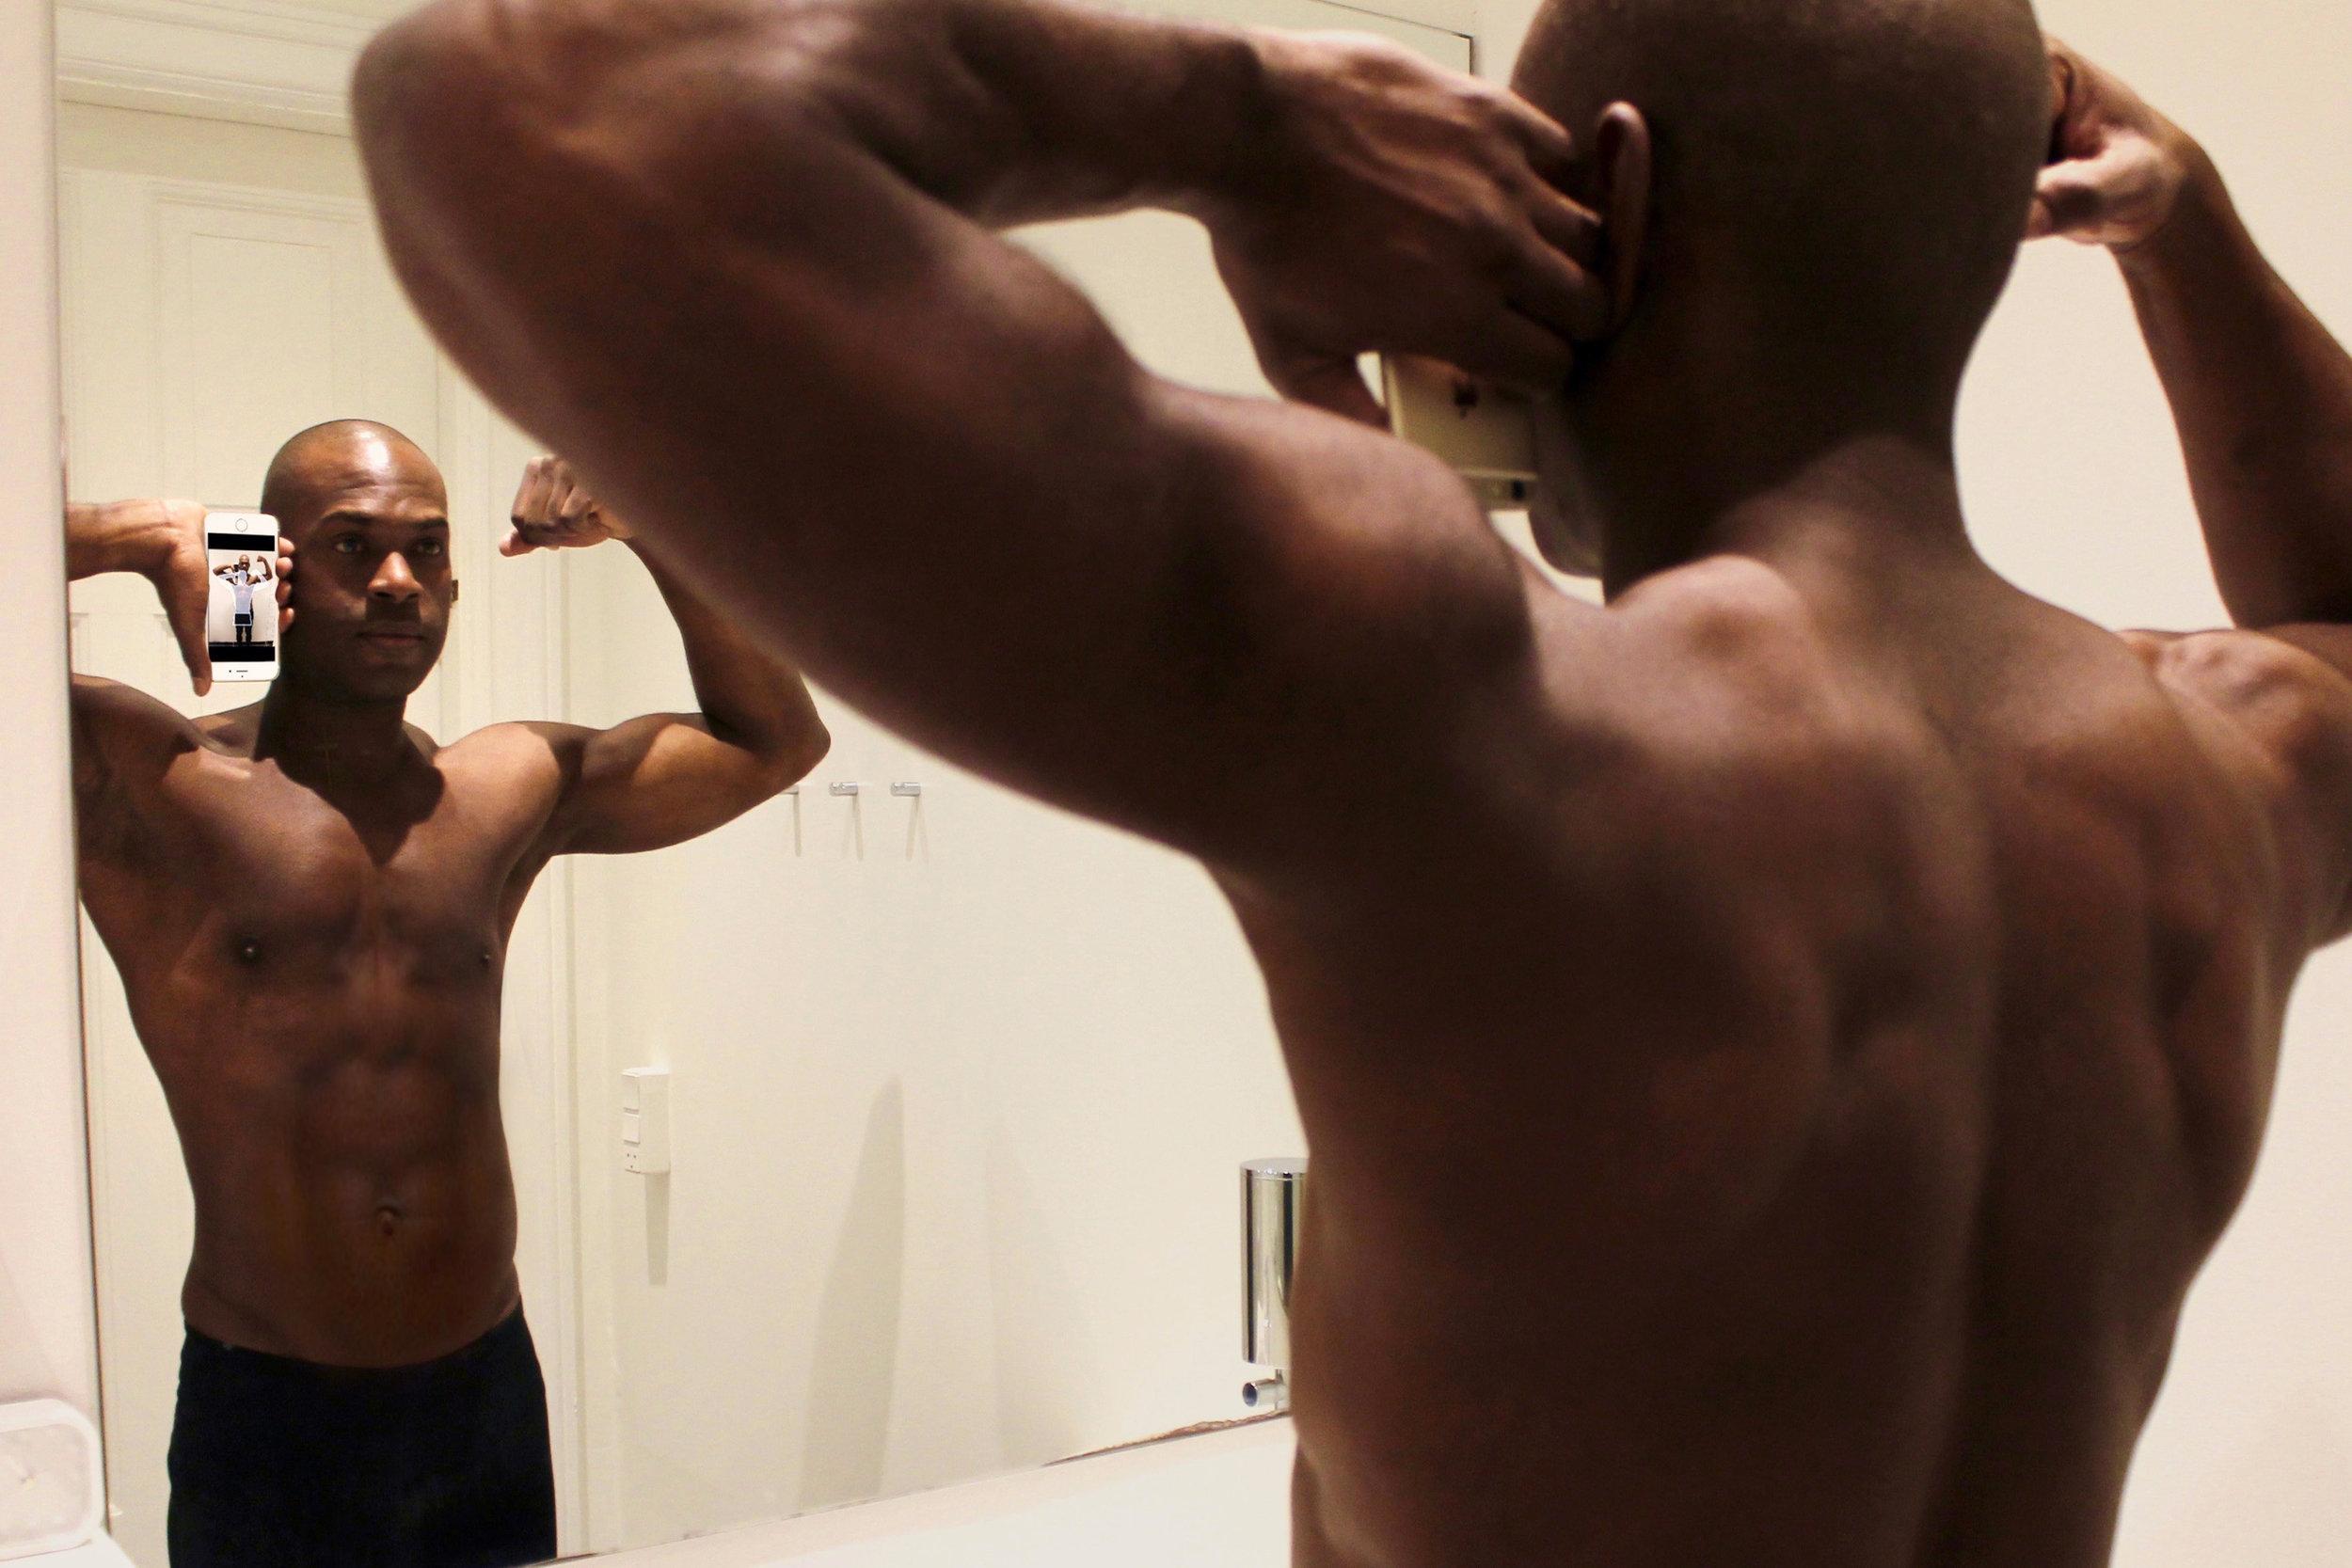 Bodybarista Body Measurement App Best Ways To Take Your Body Measurements